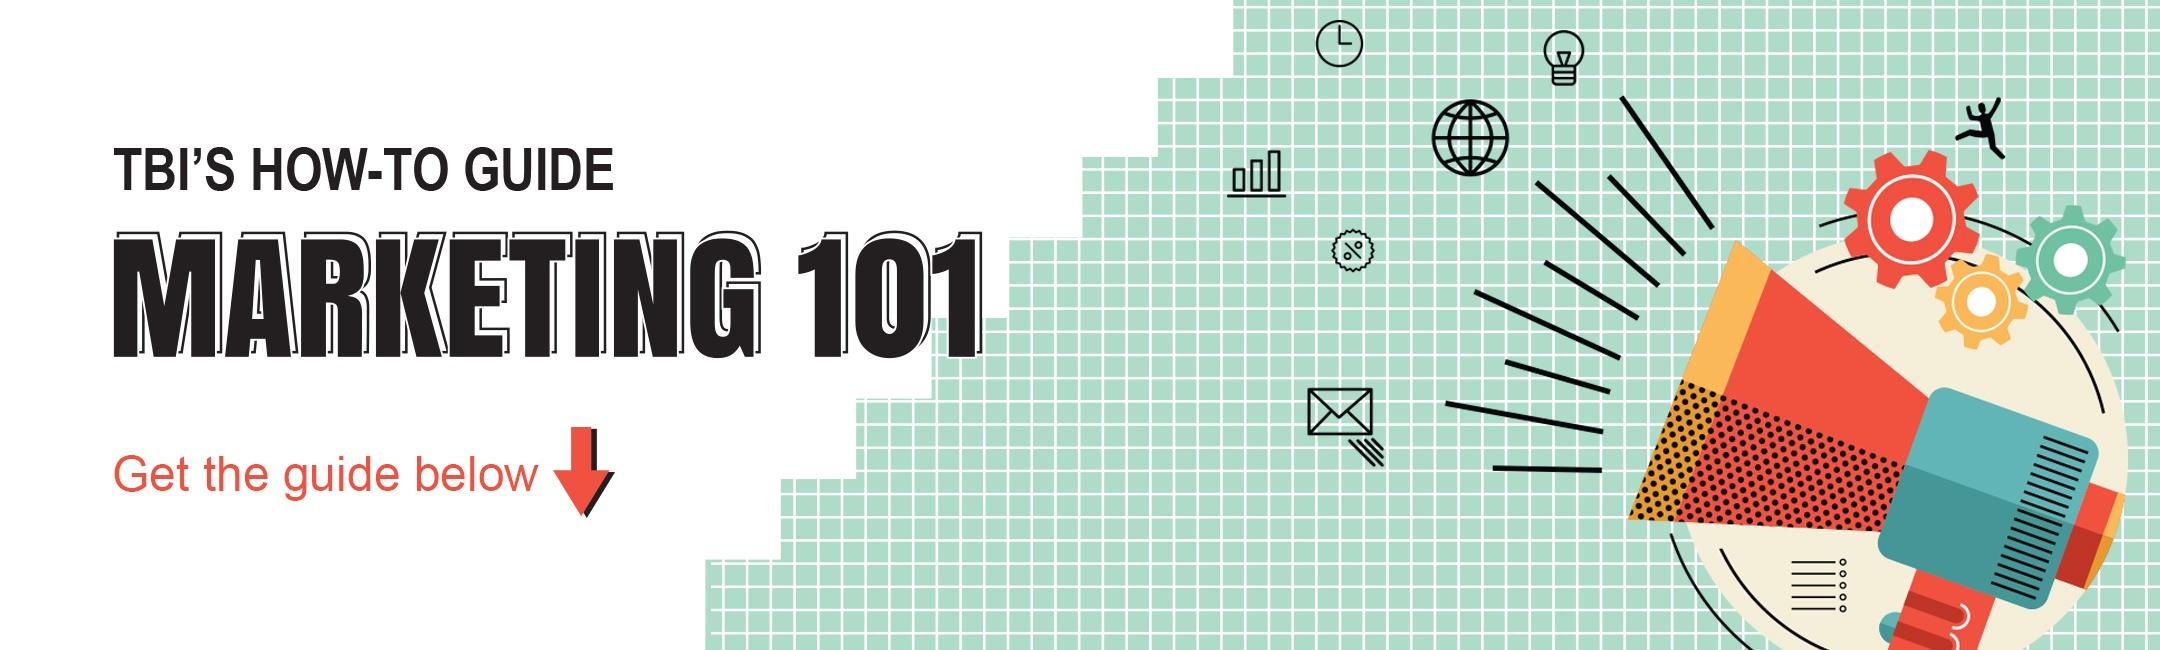 Marketing-101-LP.jpg